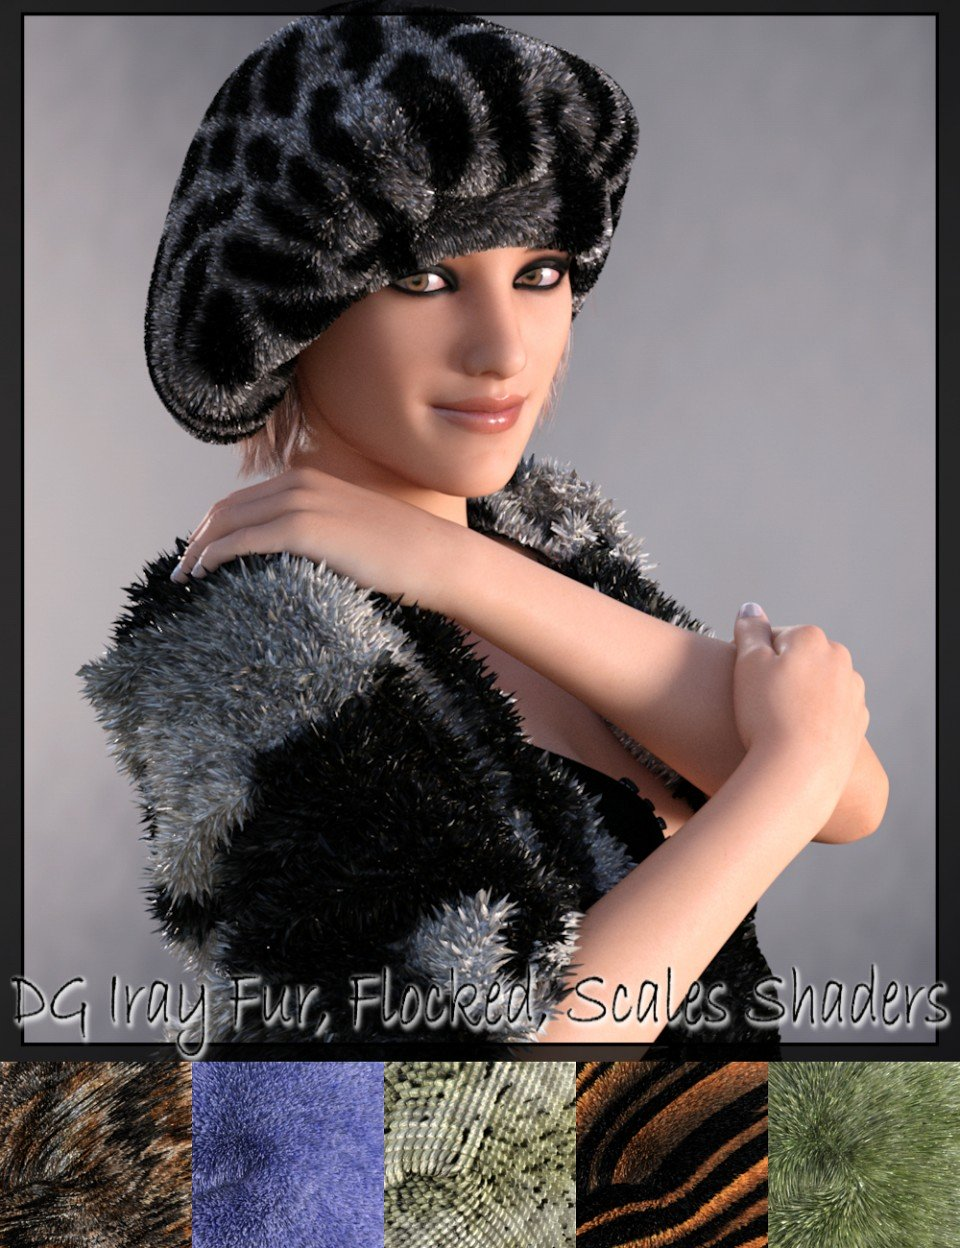 DG Iray Fur, Flocking, Scales Shader Presets_DAZ3D下载站